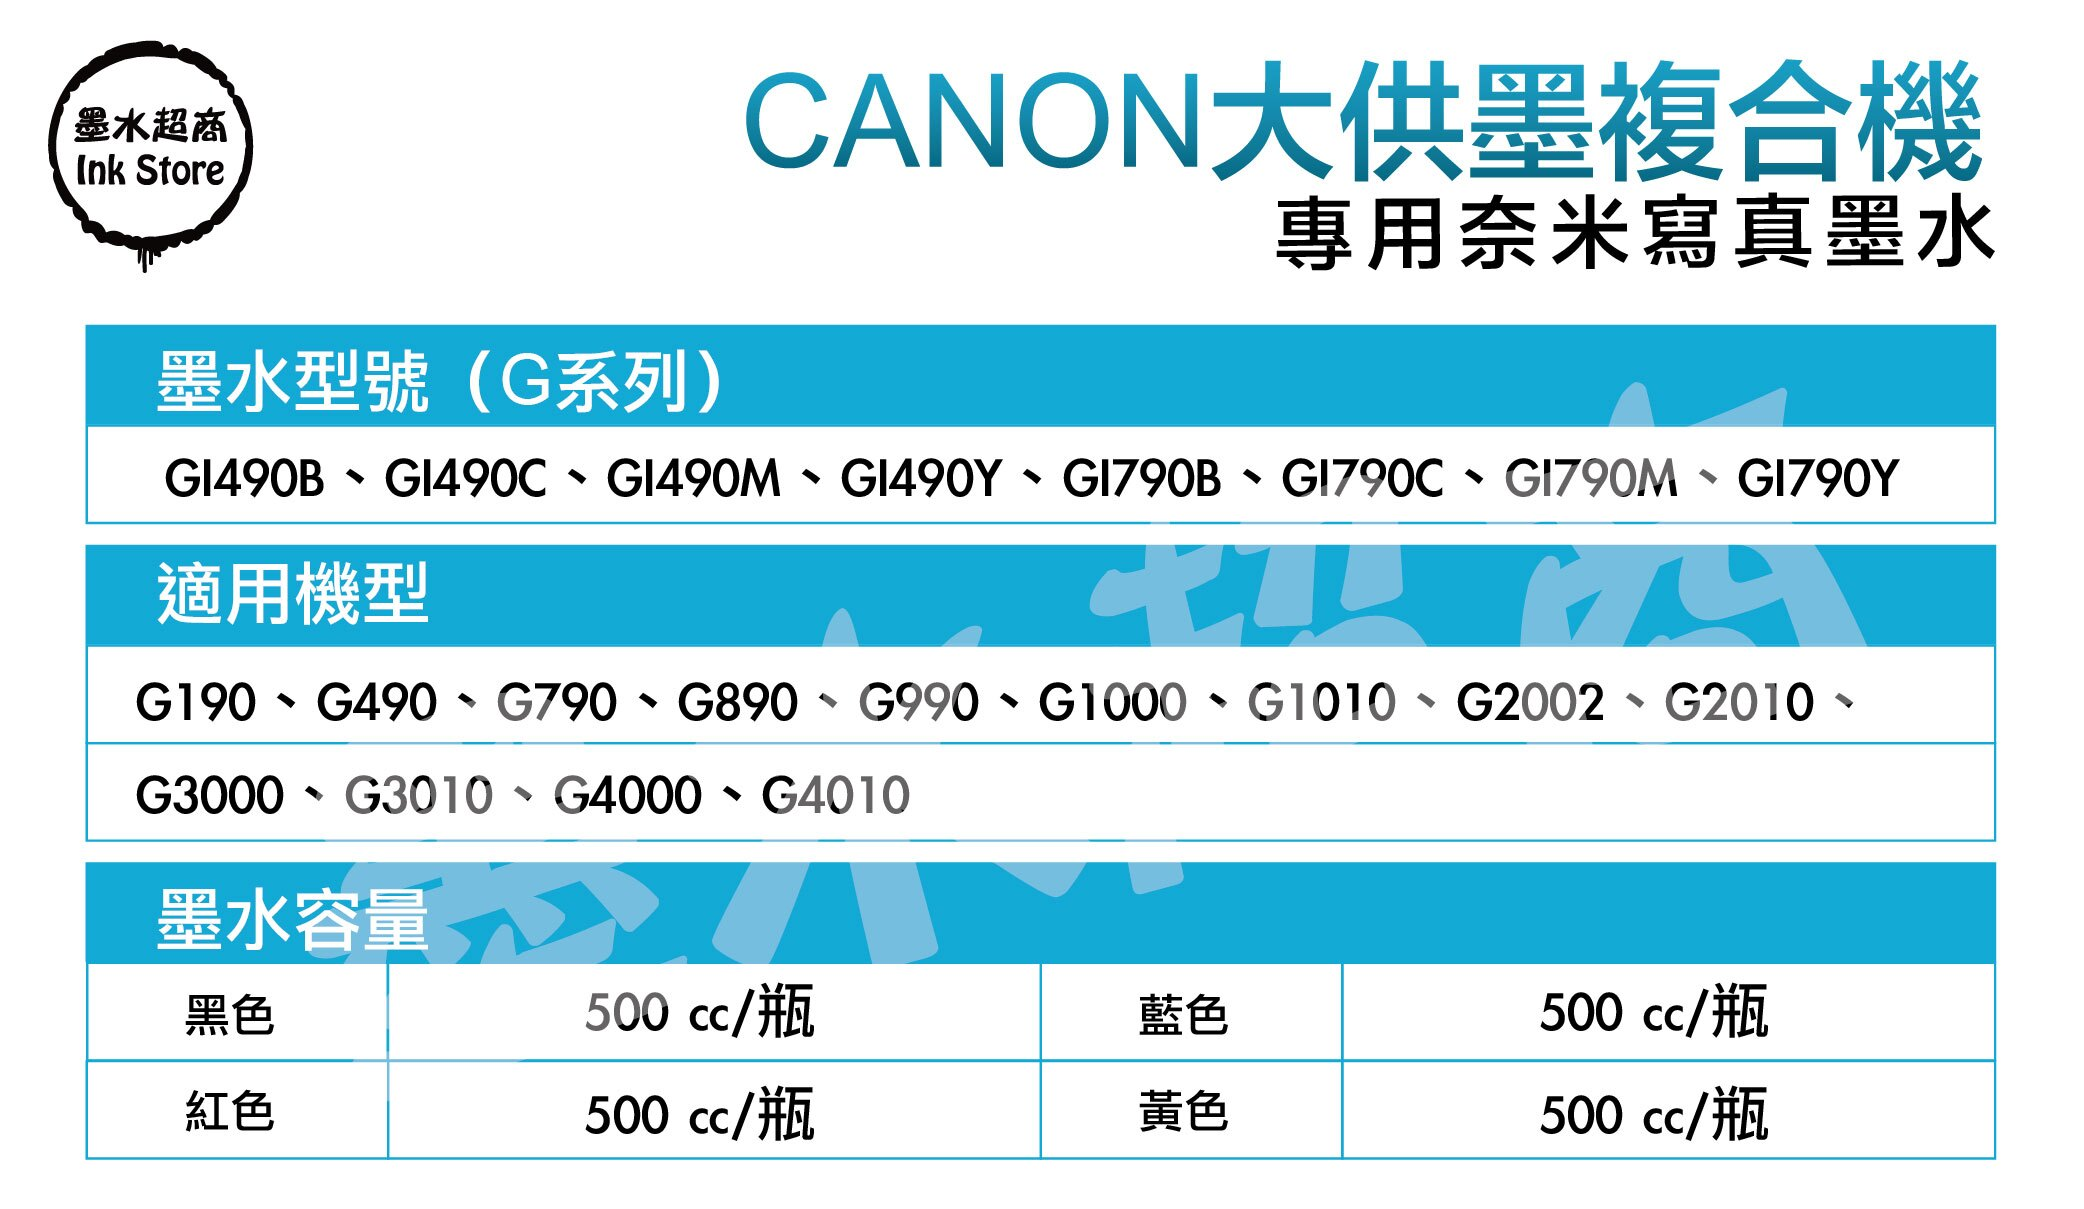 G1000/G1010/G2002/G2010/G3000/G3010/G4000/G4010